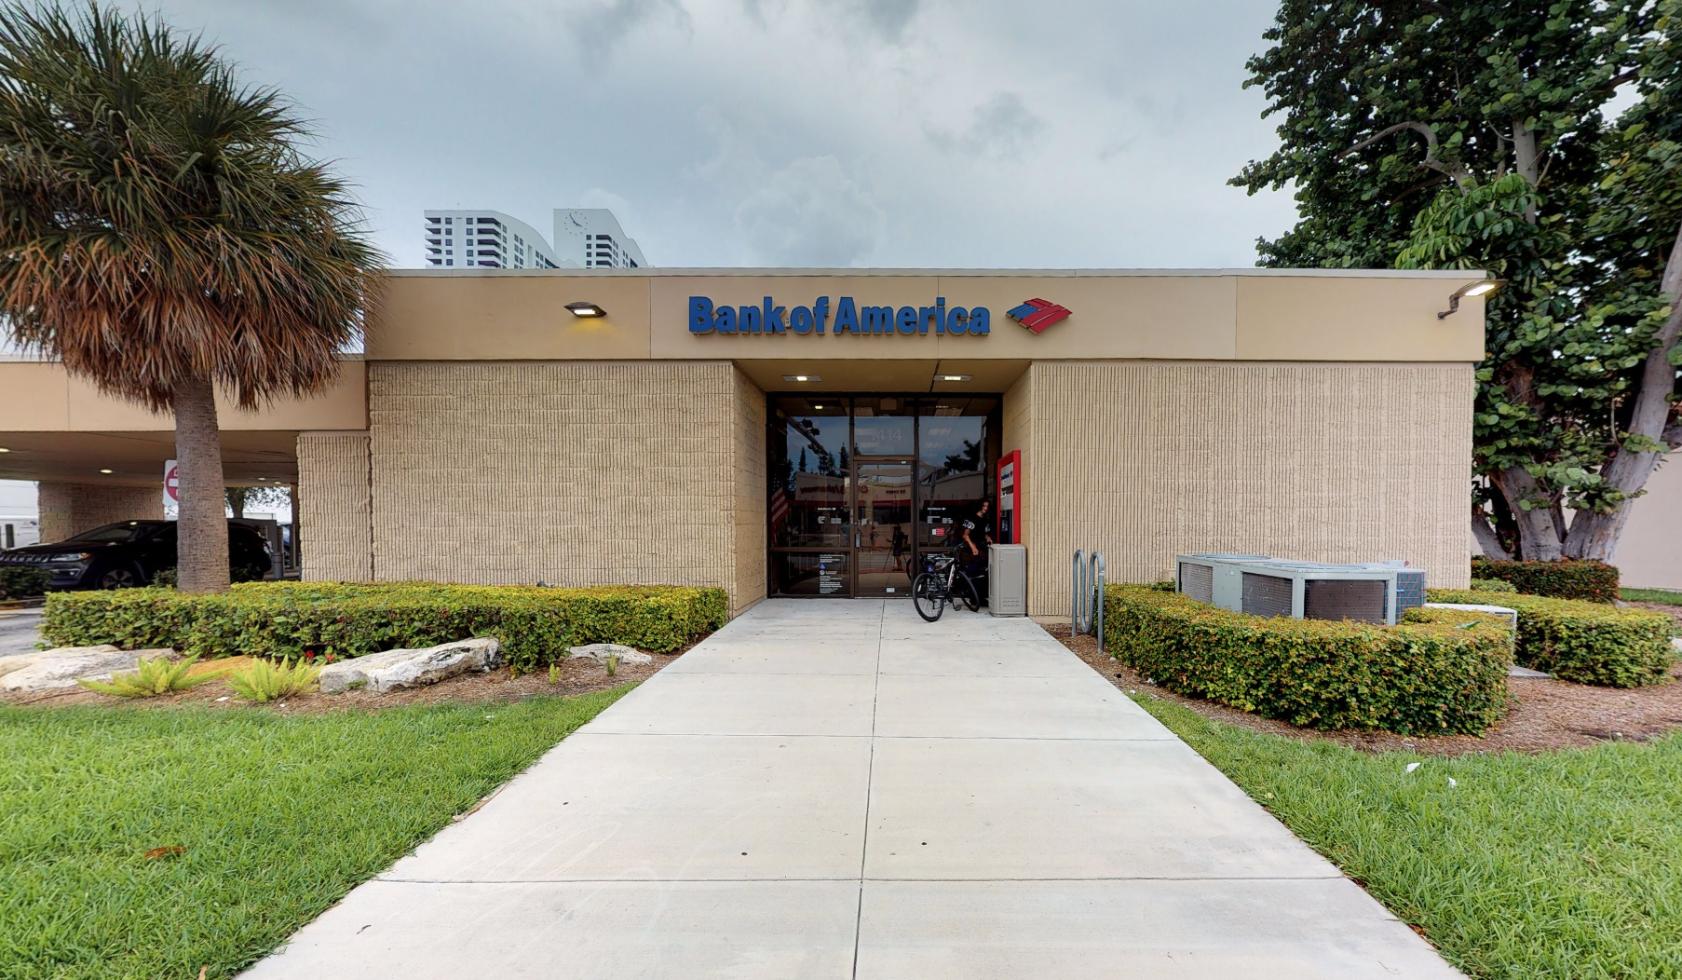 Bank of America financial center with drive-thru ATM and teller   1414 Alton Rd, Miami Beach, FL 33139